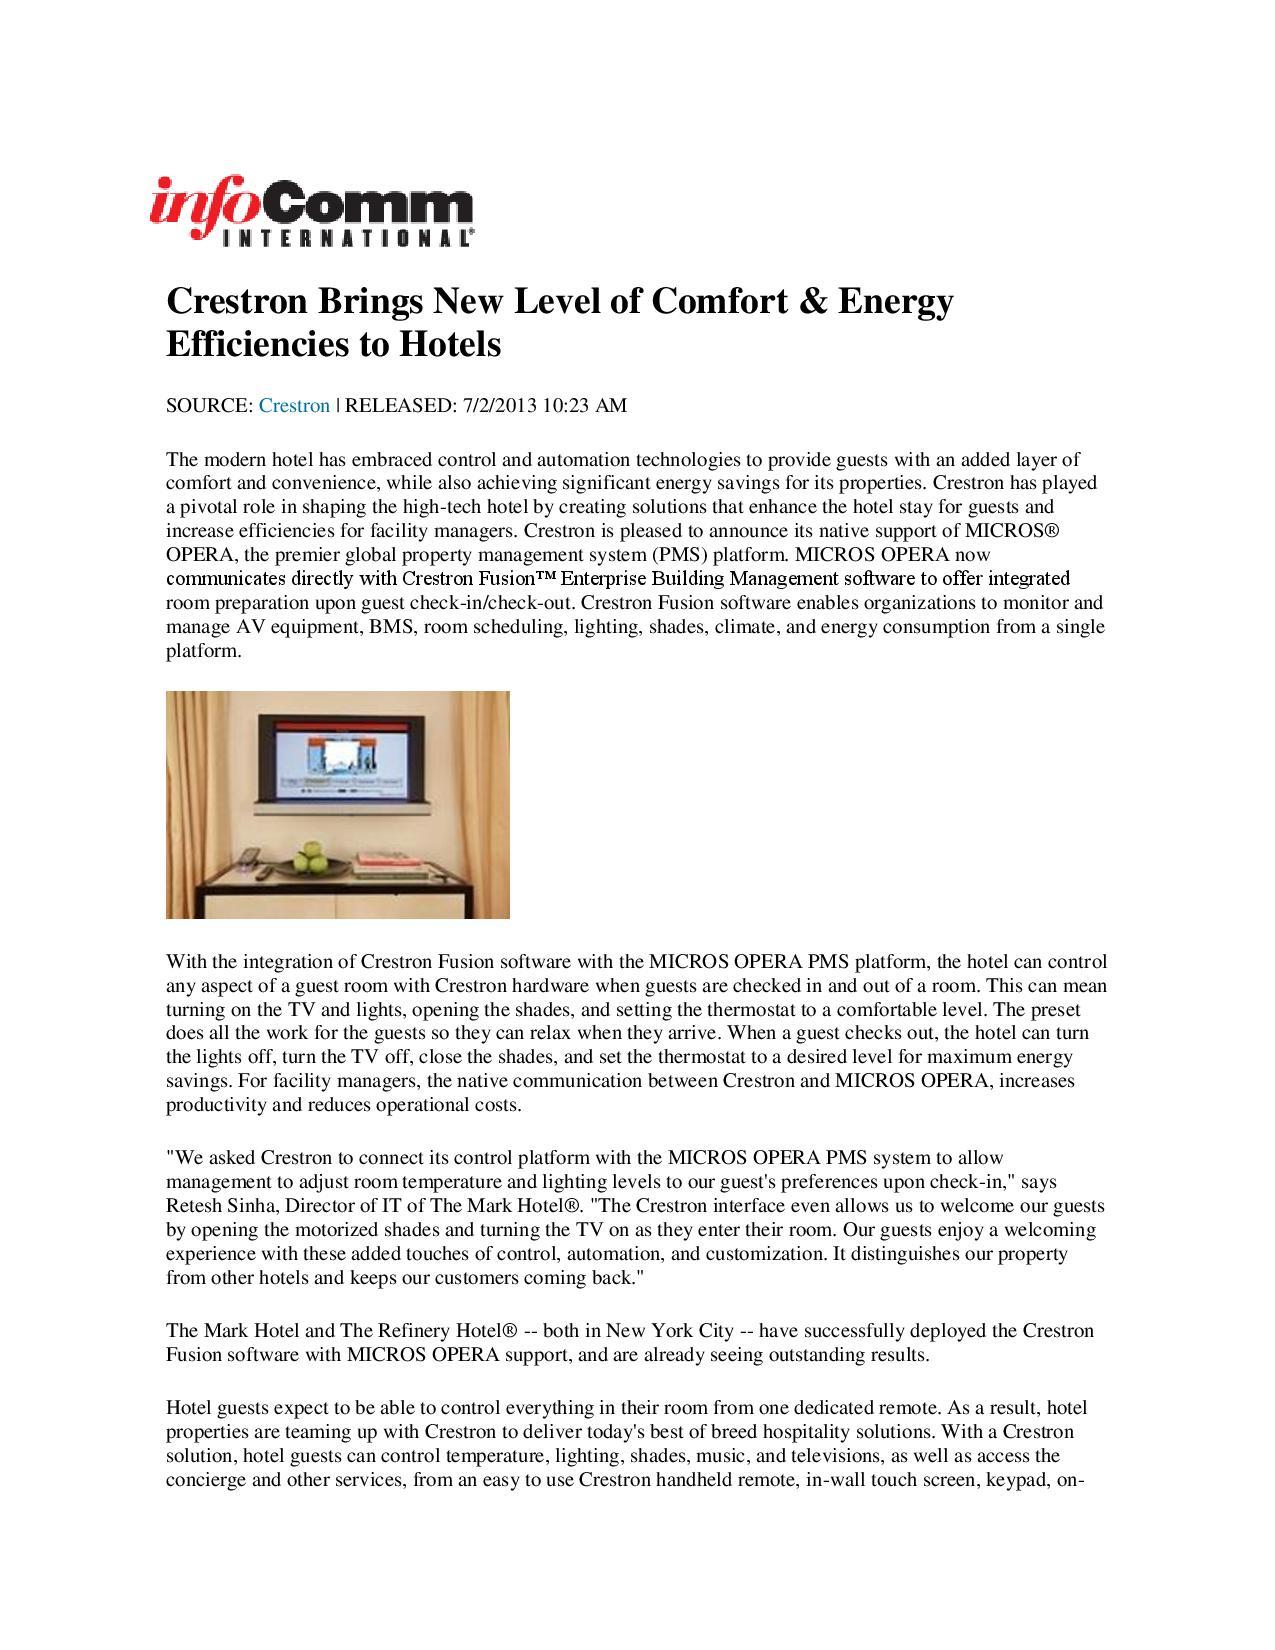 InfoComm International, the Audiovisual (AV) Association Crestron Brings New Level of Comfort & Energy Efficiencies to Hotels-page-001